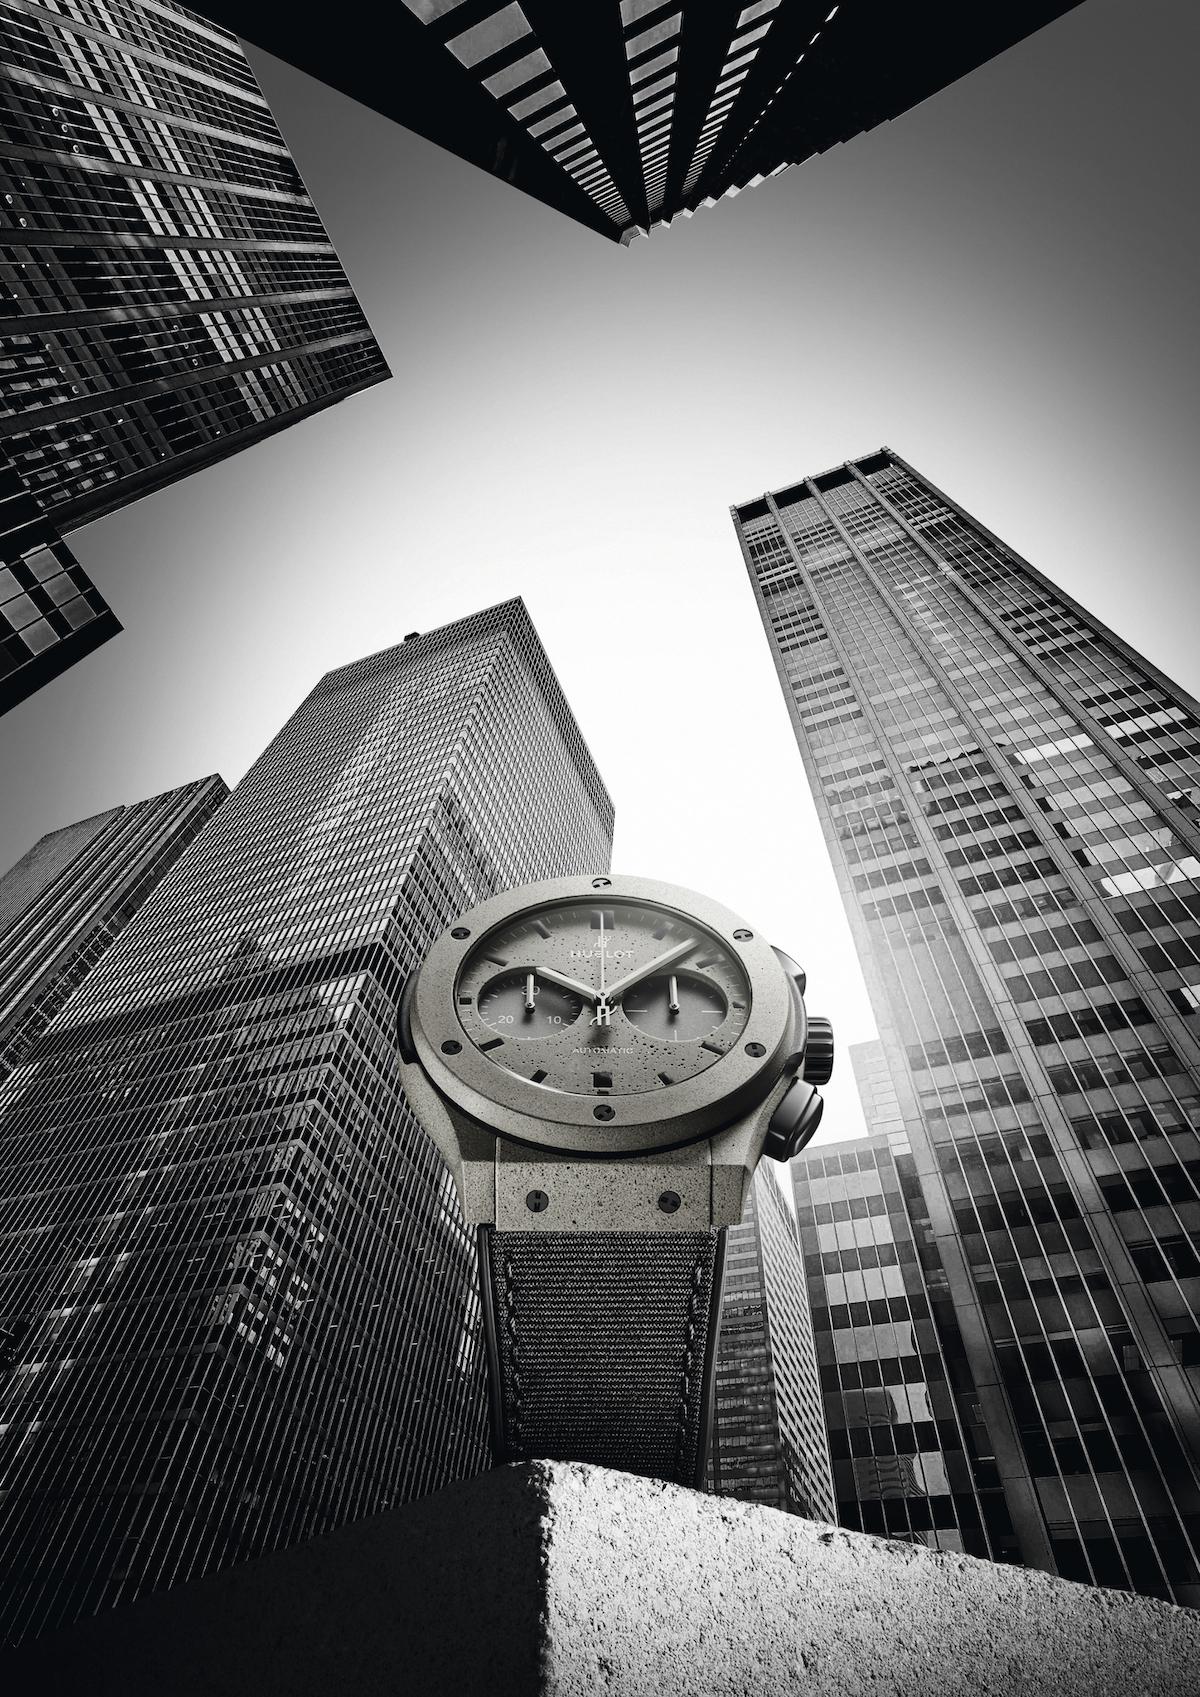 Hublot Concrete Jungle New York watch